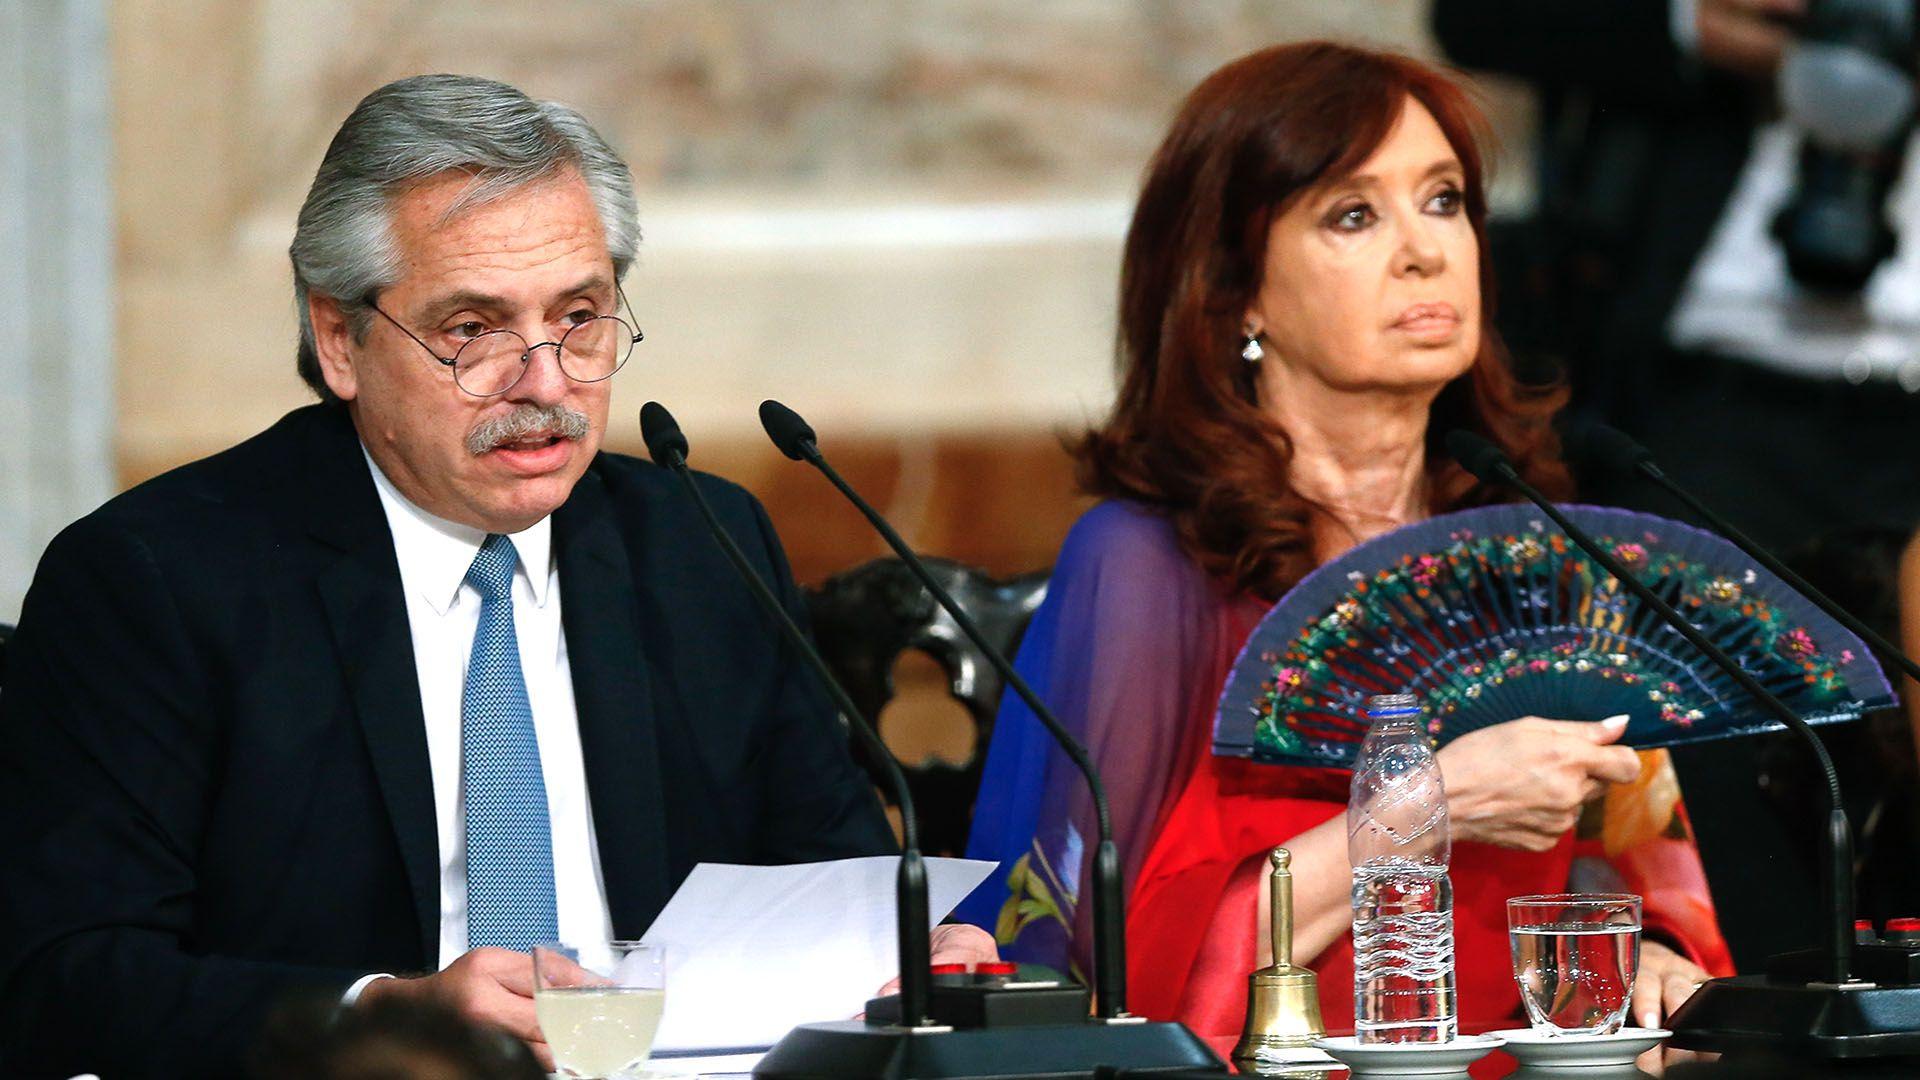 El presidente Alberto Fernández y la vice Cristina Kirchner (EFE/ Juan Ignacio Roncoroni)